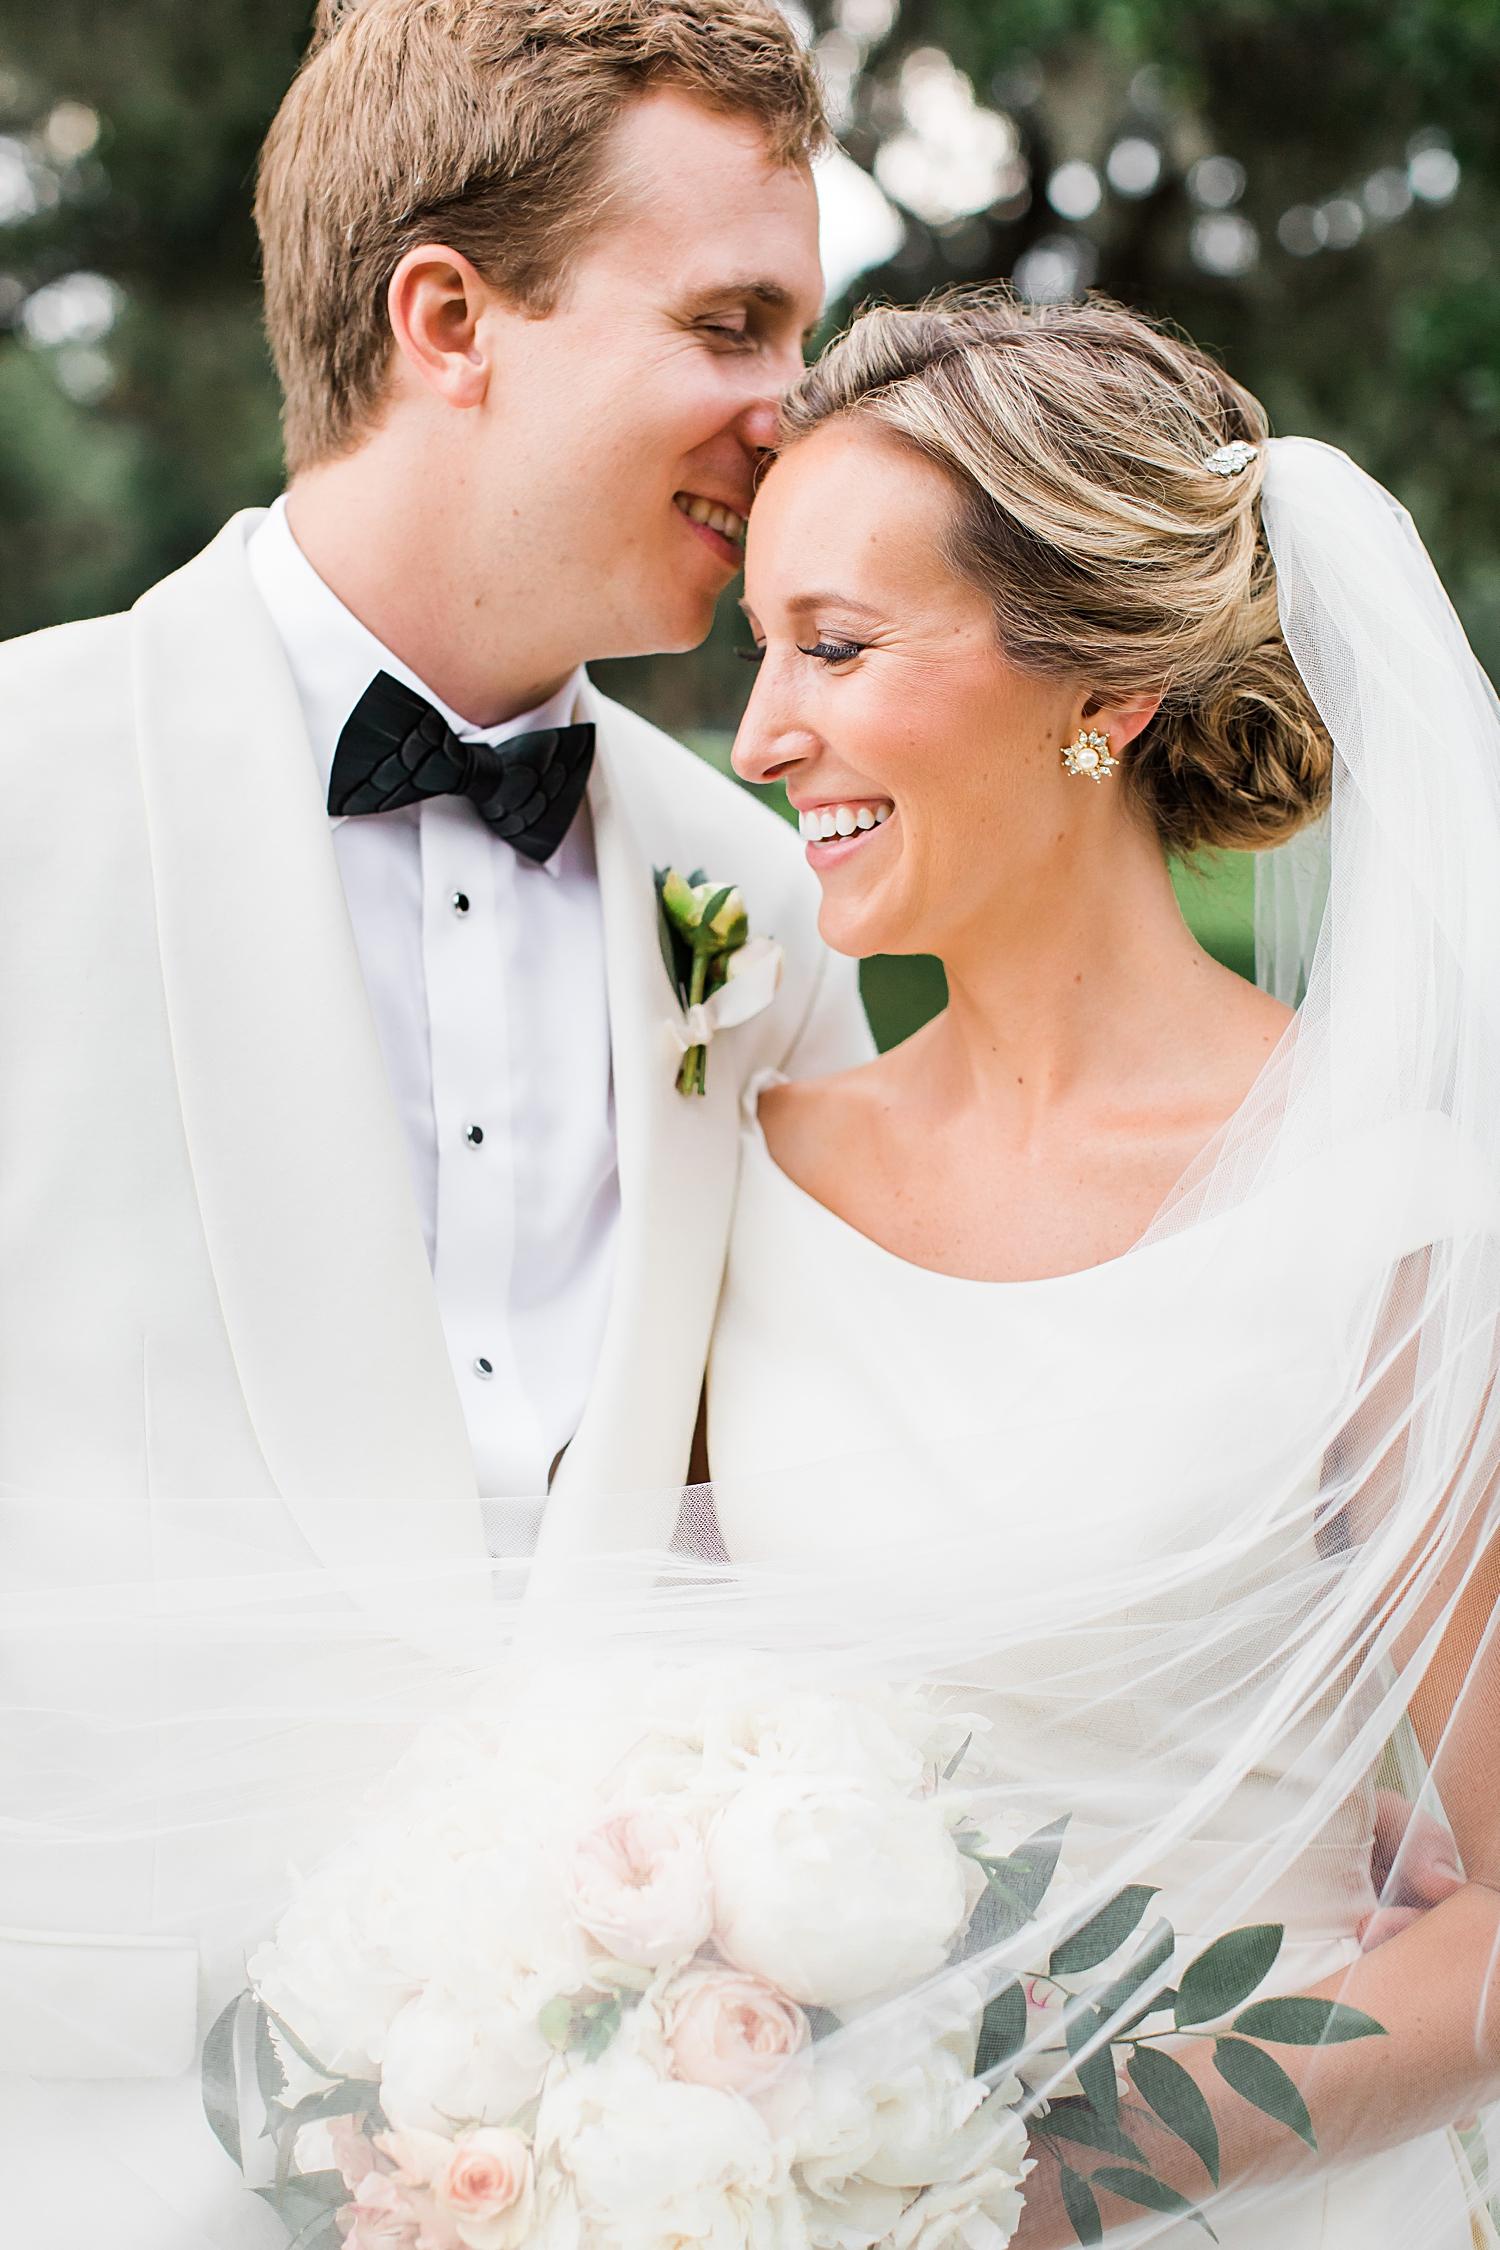 beaufort-sc-wedding-photographer-tabby-place-beaufort-inn-jb-marie-photography